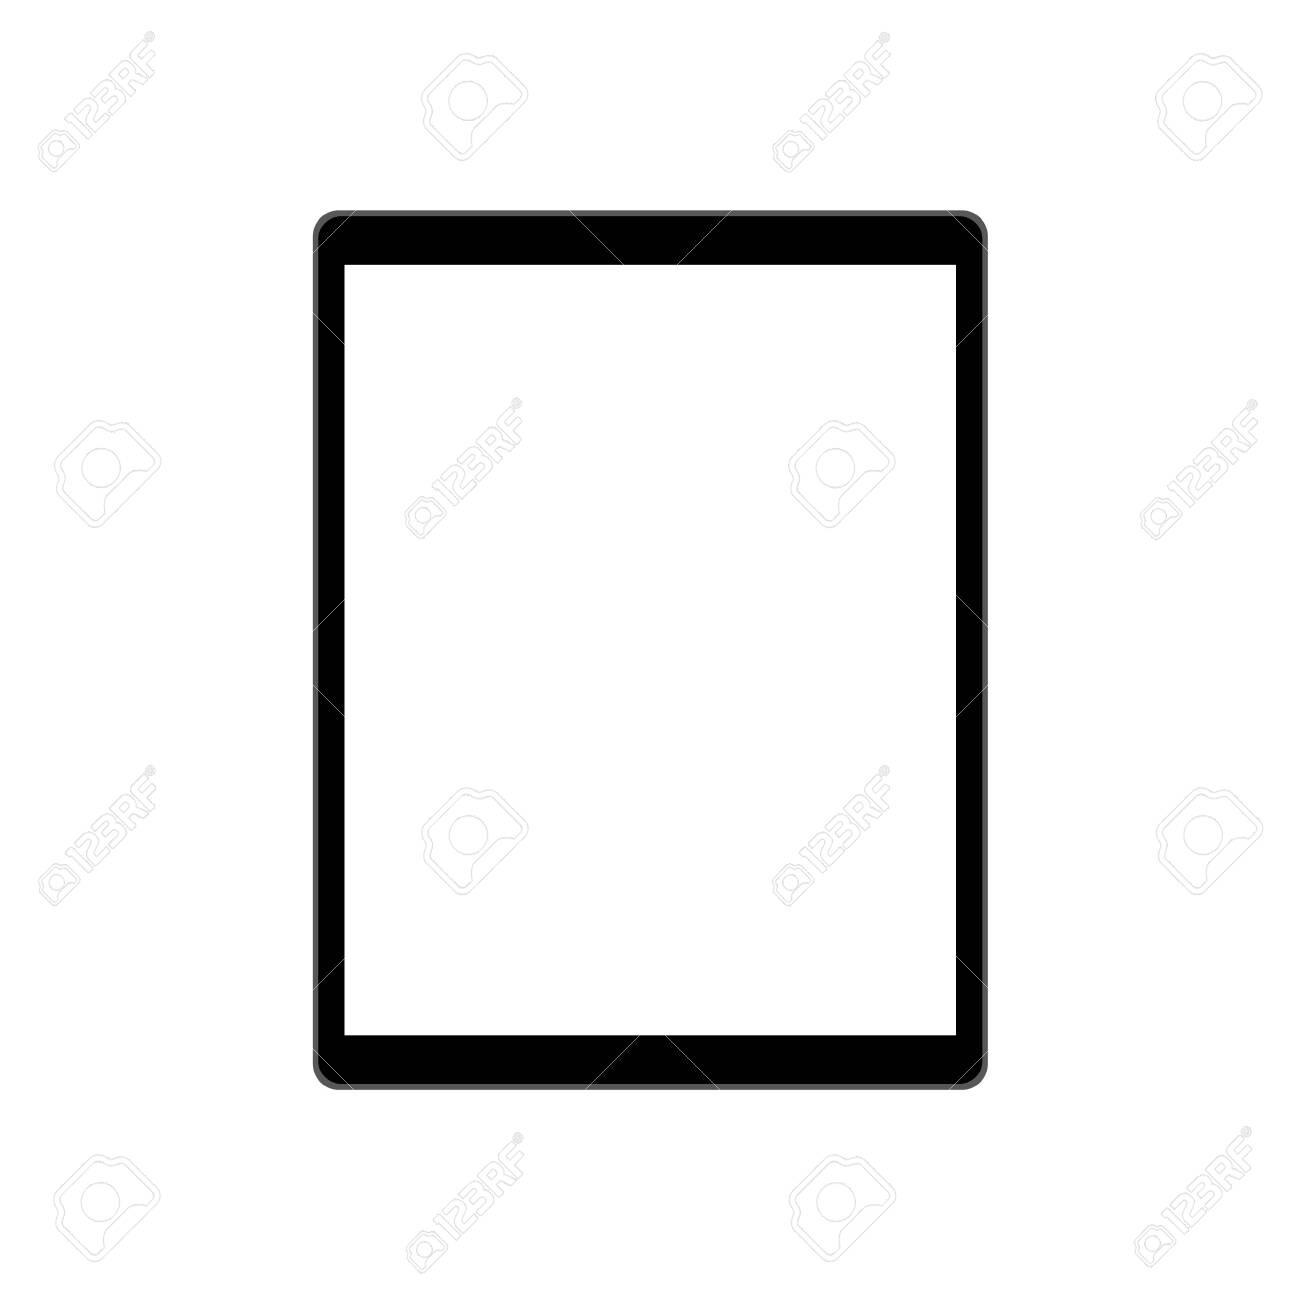 Mockup modern tablet, vector technological device - 135728118